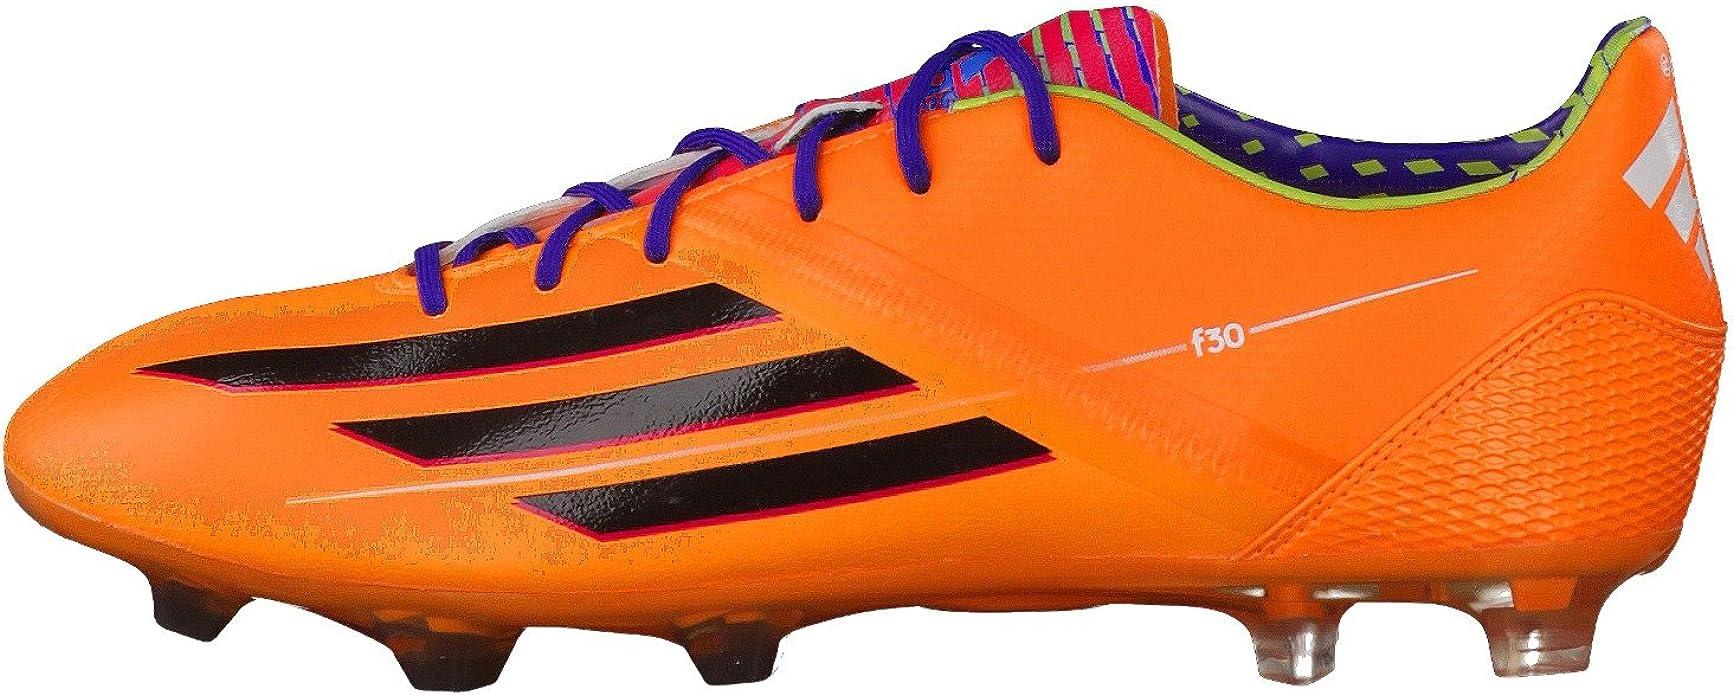 adidas F30 TRX TF - Botas de fútbol para Hombre Naranja Solar ...